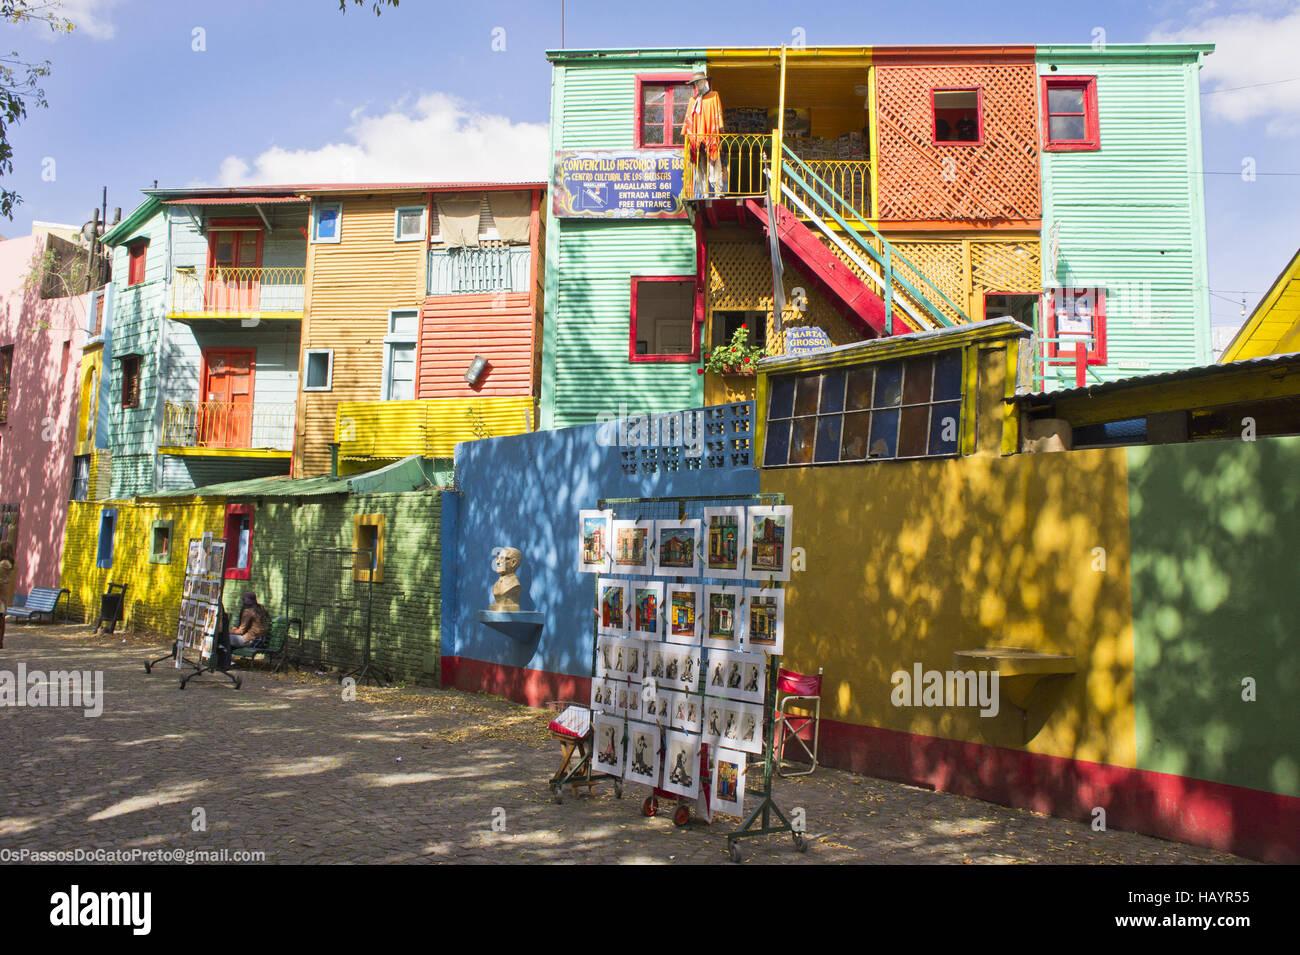 L'ARGENTINE, Buenos Aires, La Boca Photo Stock